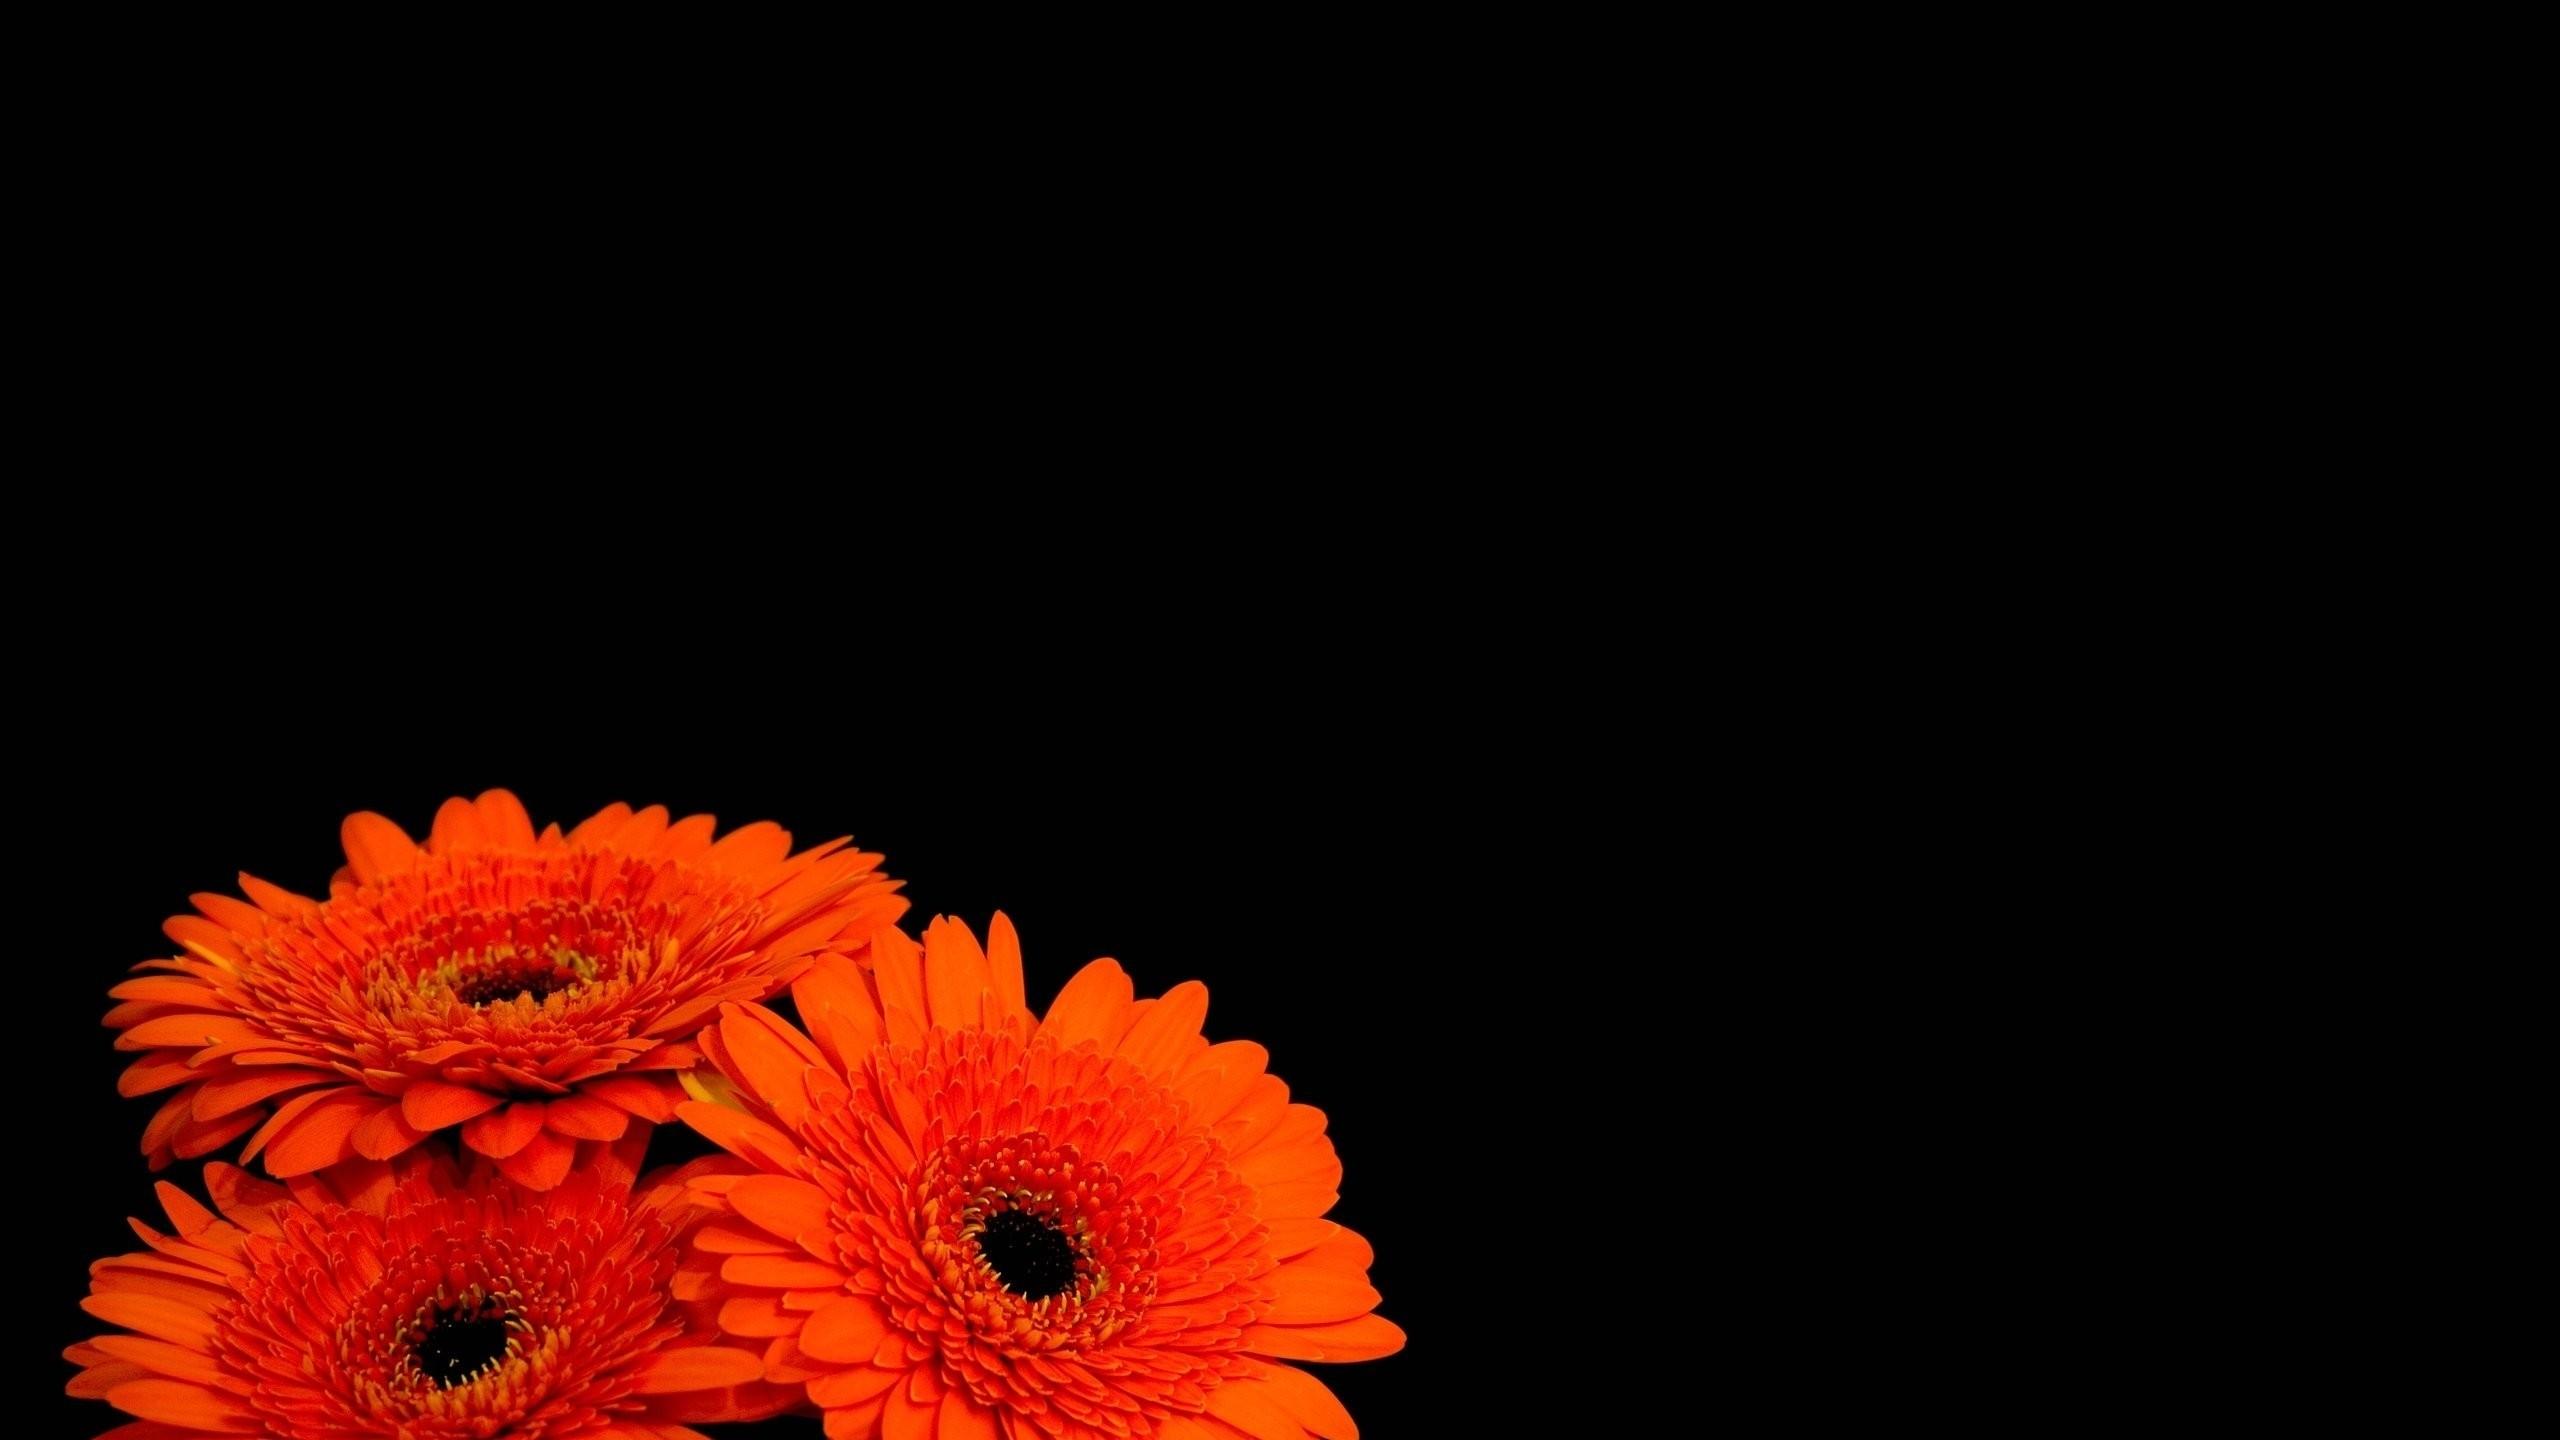 Description: Download Flowers black background orange flowers wallpaper/desktop  background in HD & Widescreen resolution.